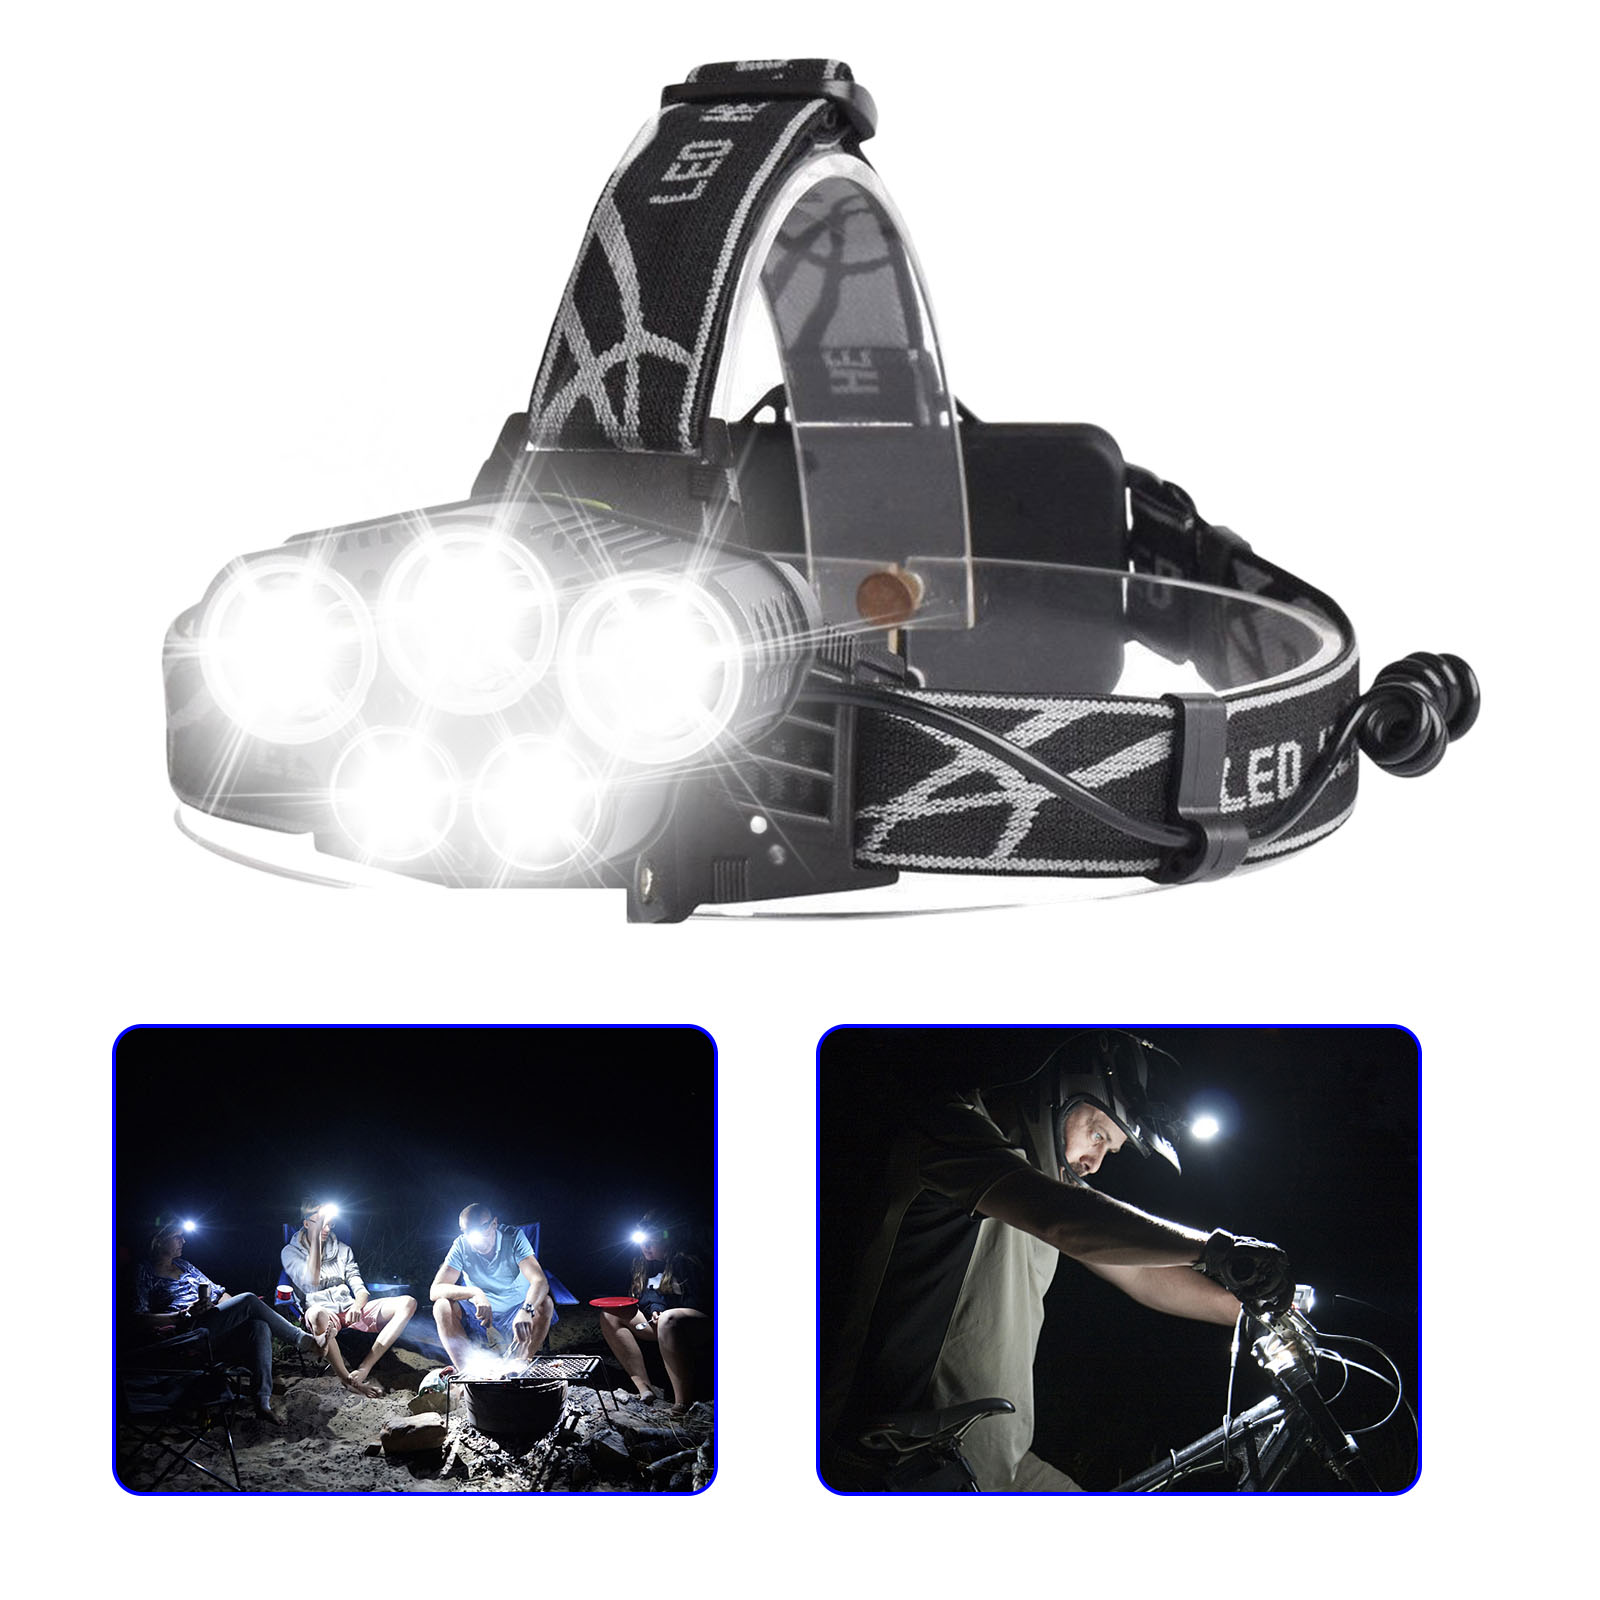 80000LM 5-Modes 5 LED White Super Bright Headlamp Rechargeable Light Waterproof Headlight Flashlight Helmet Light for Camping Running Hiking Night Fishing etc